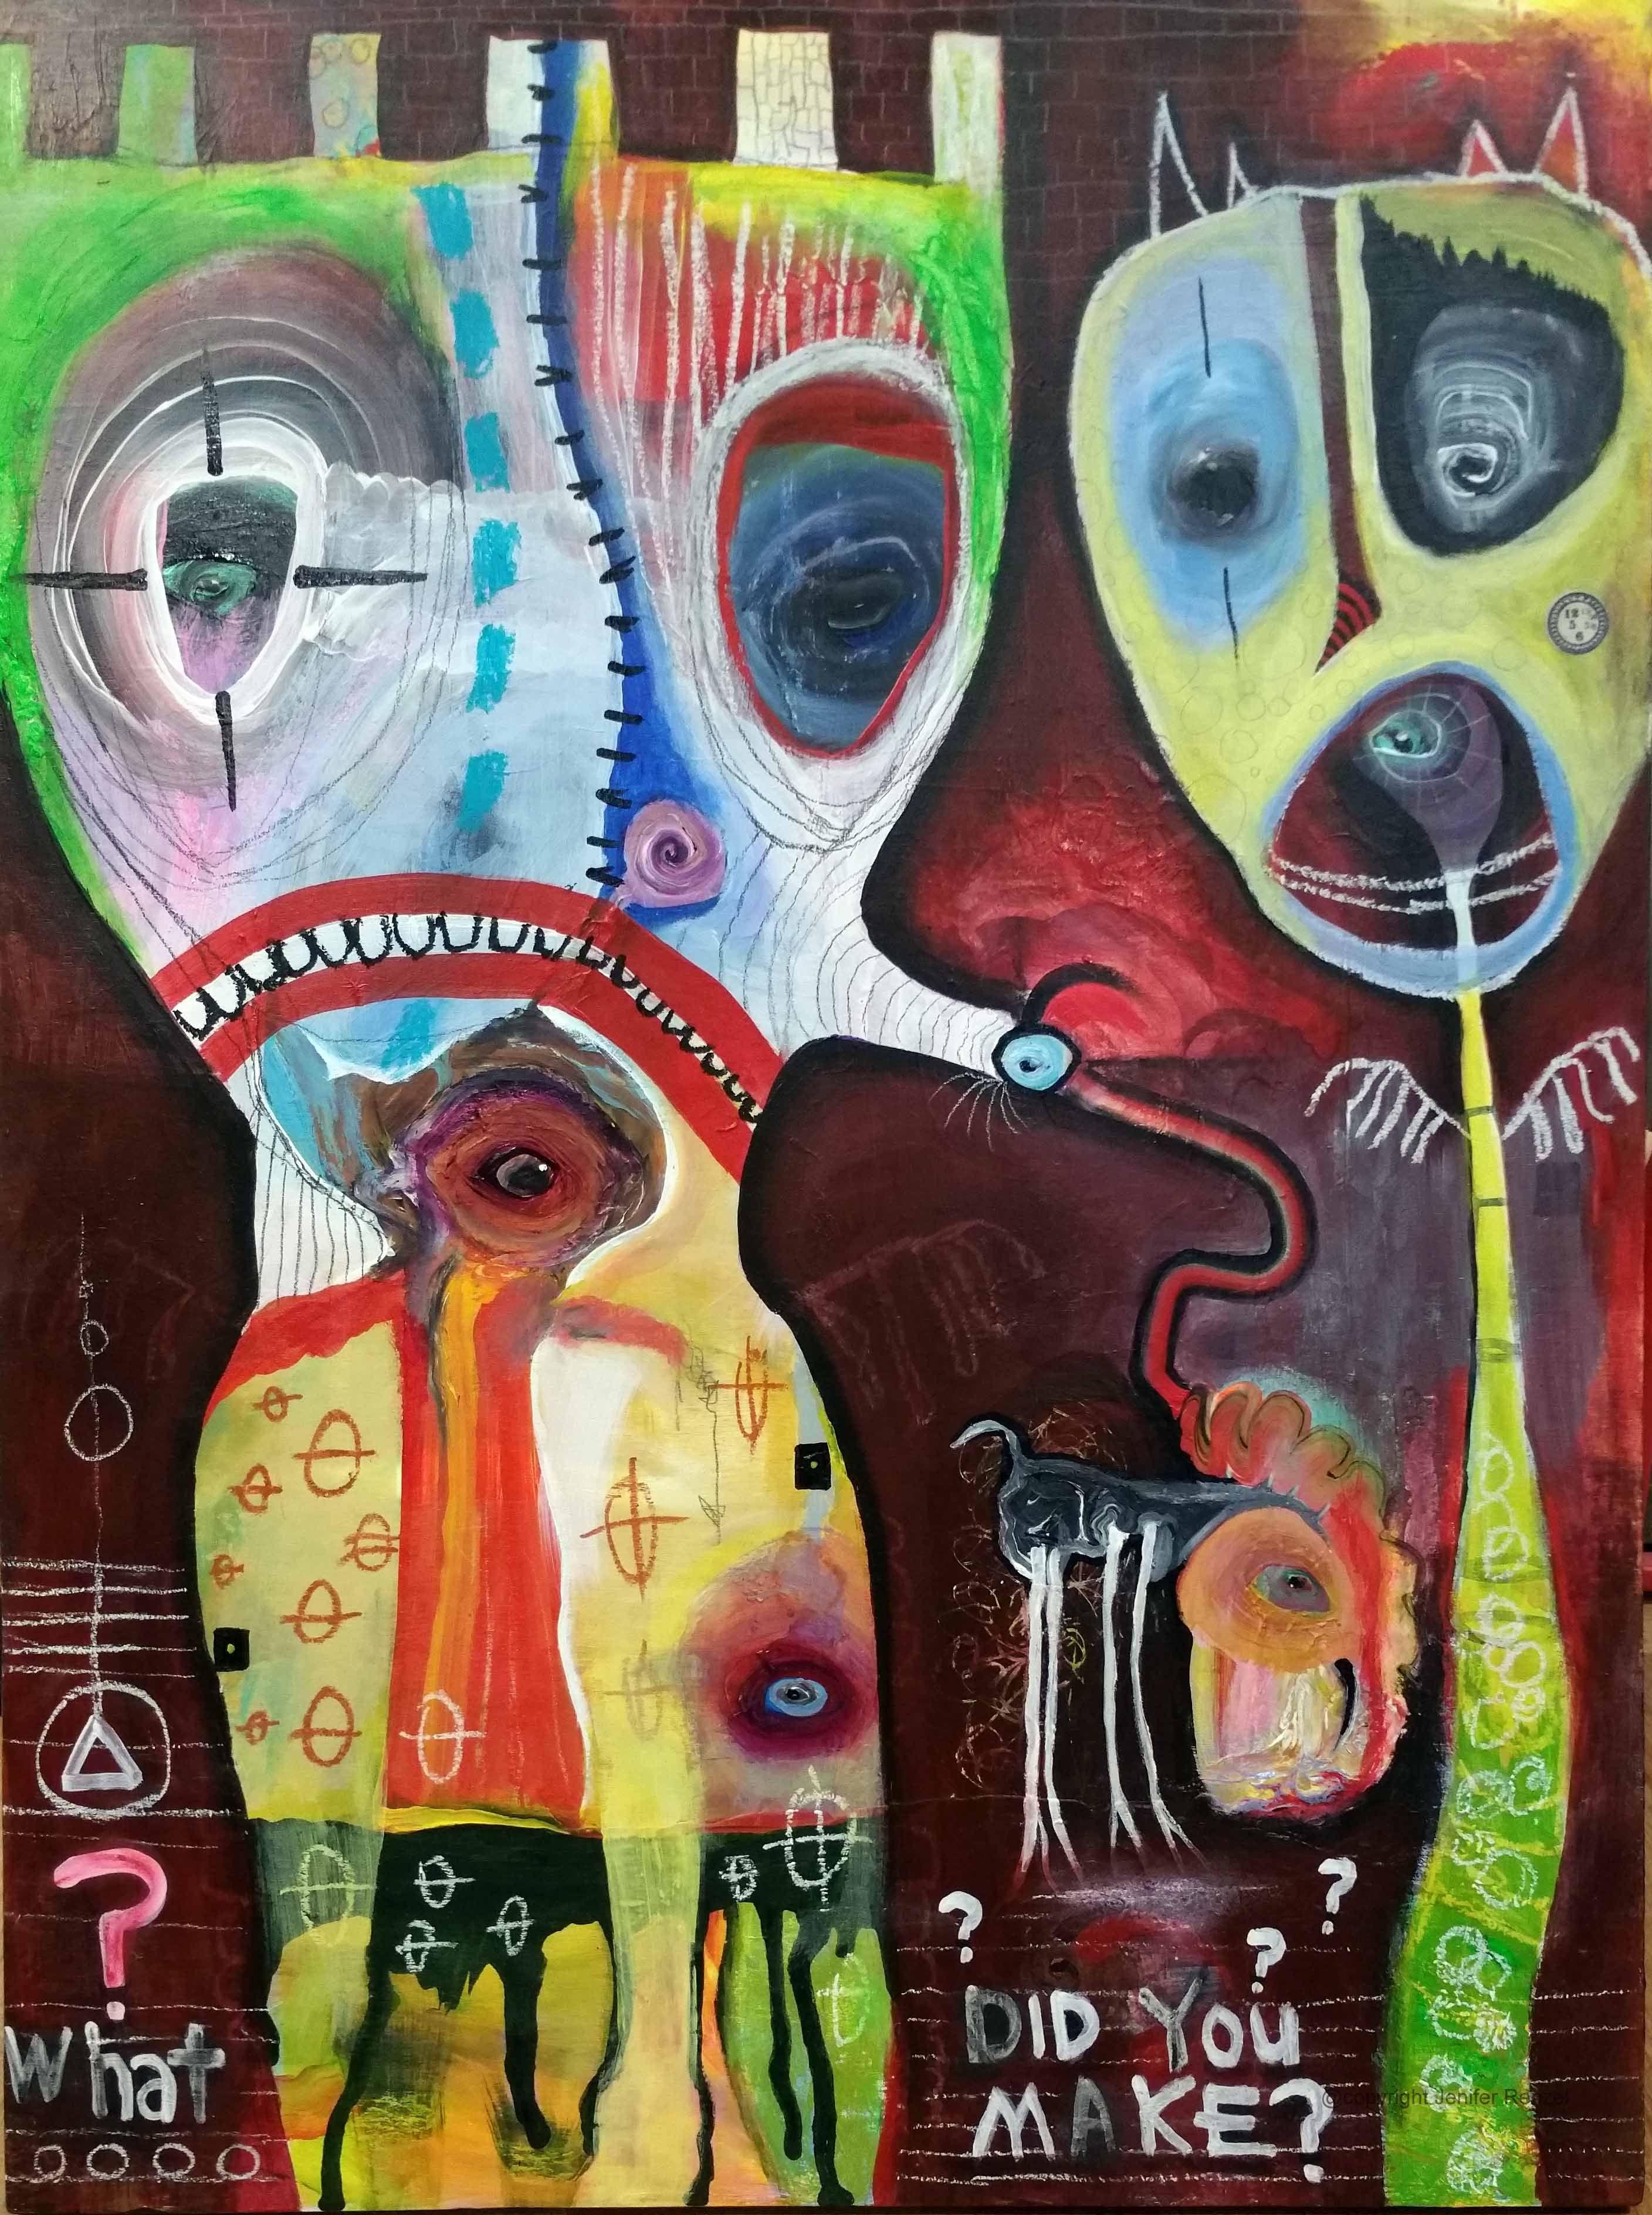 Outsider Art What Did You Make By Bugatha1 Art Outsider Art Outsider Art Painting